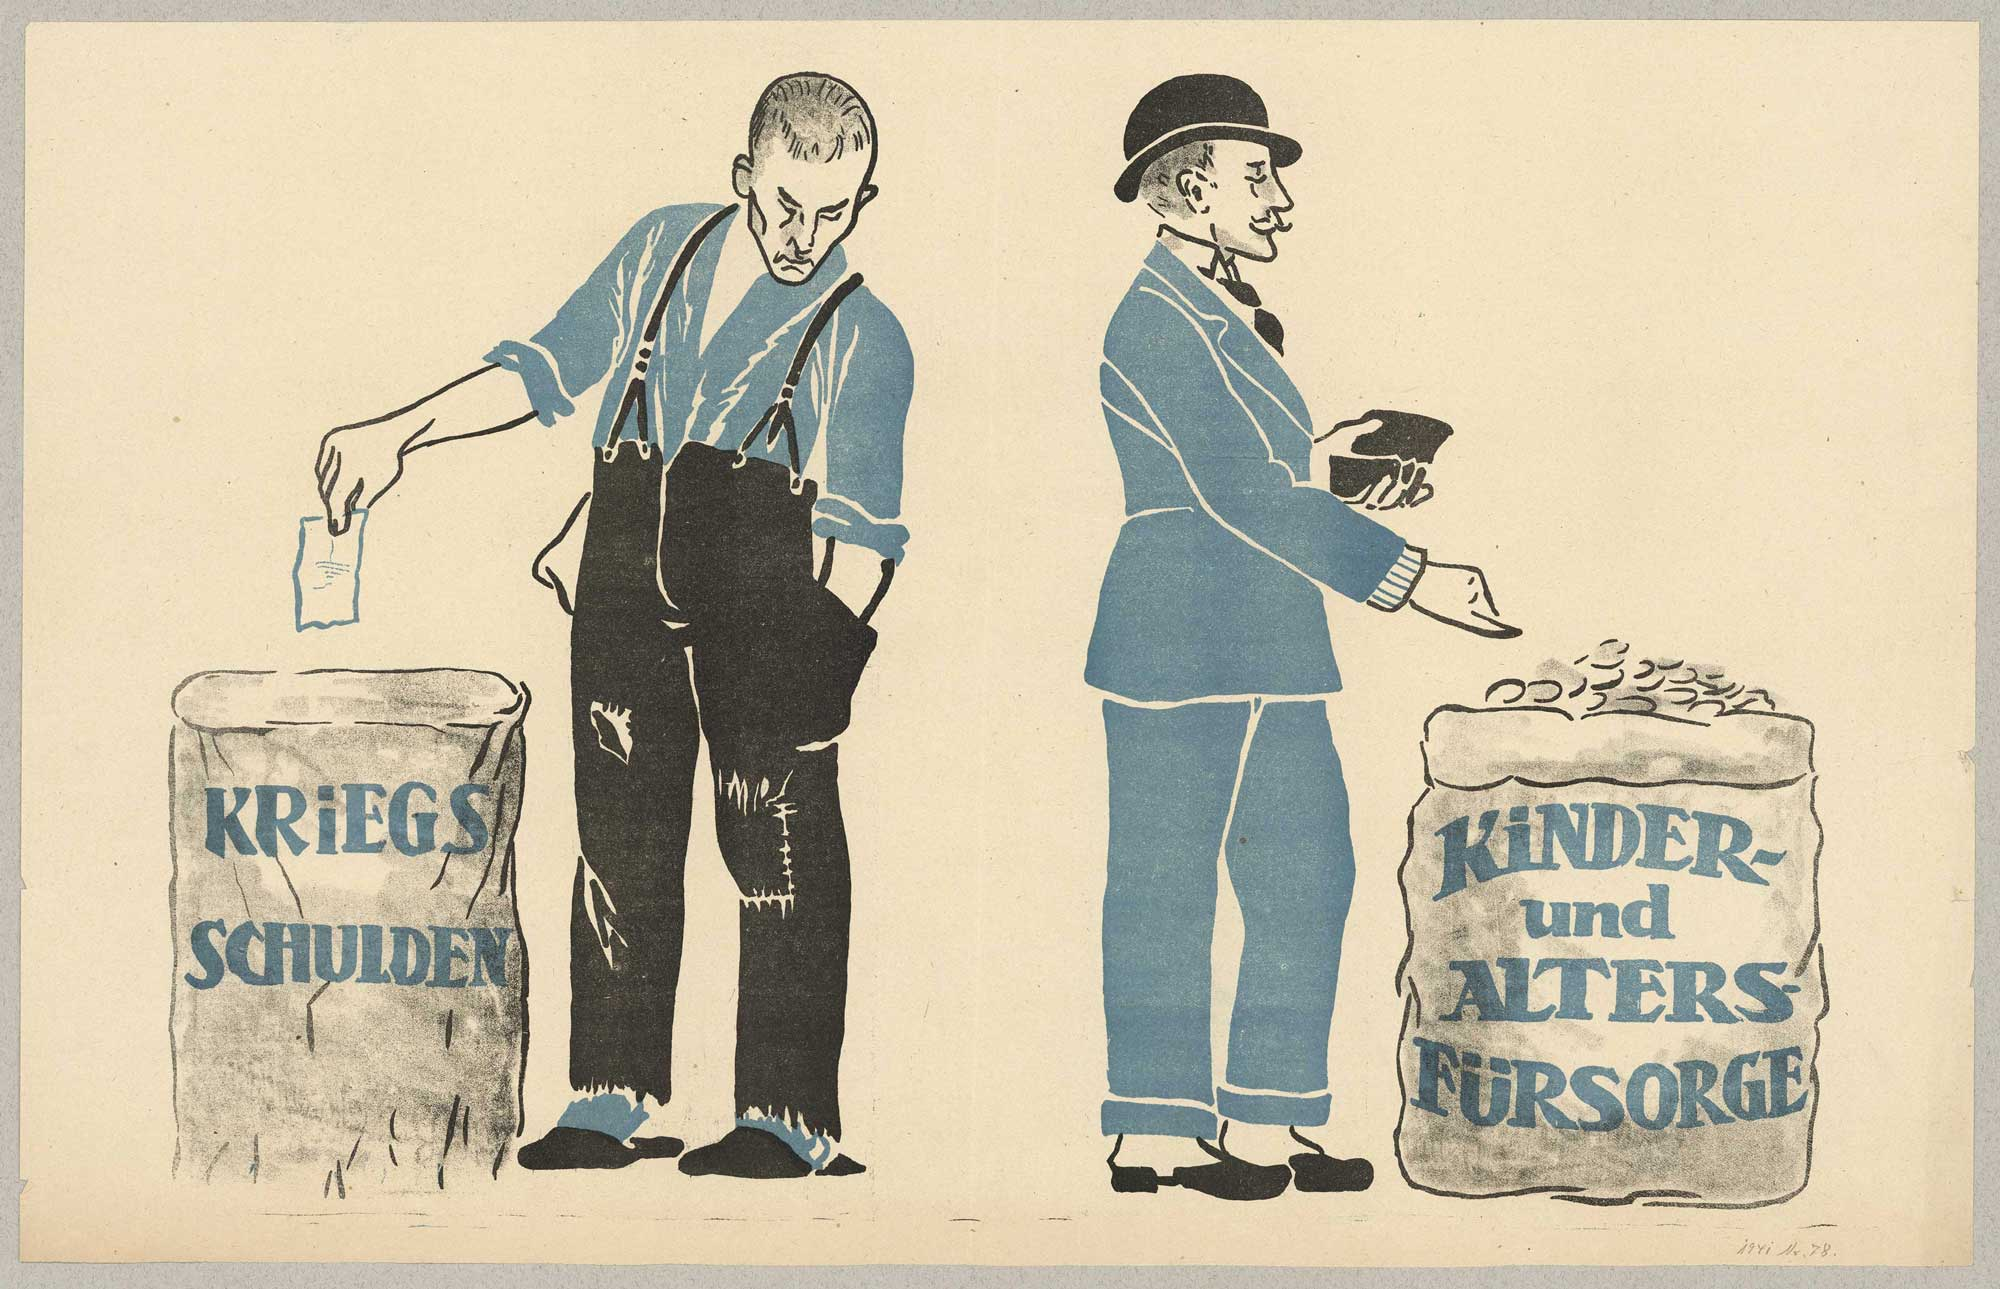 War indemnity or social welfare: Danish agitation prior to the referendum in Schleswig